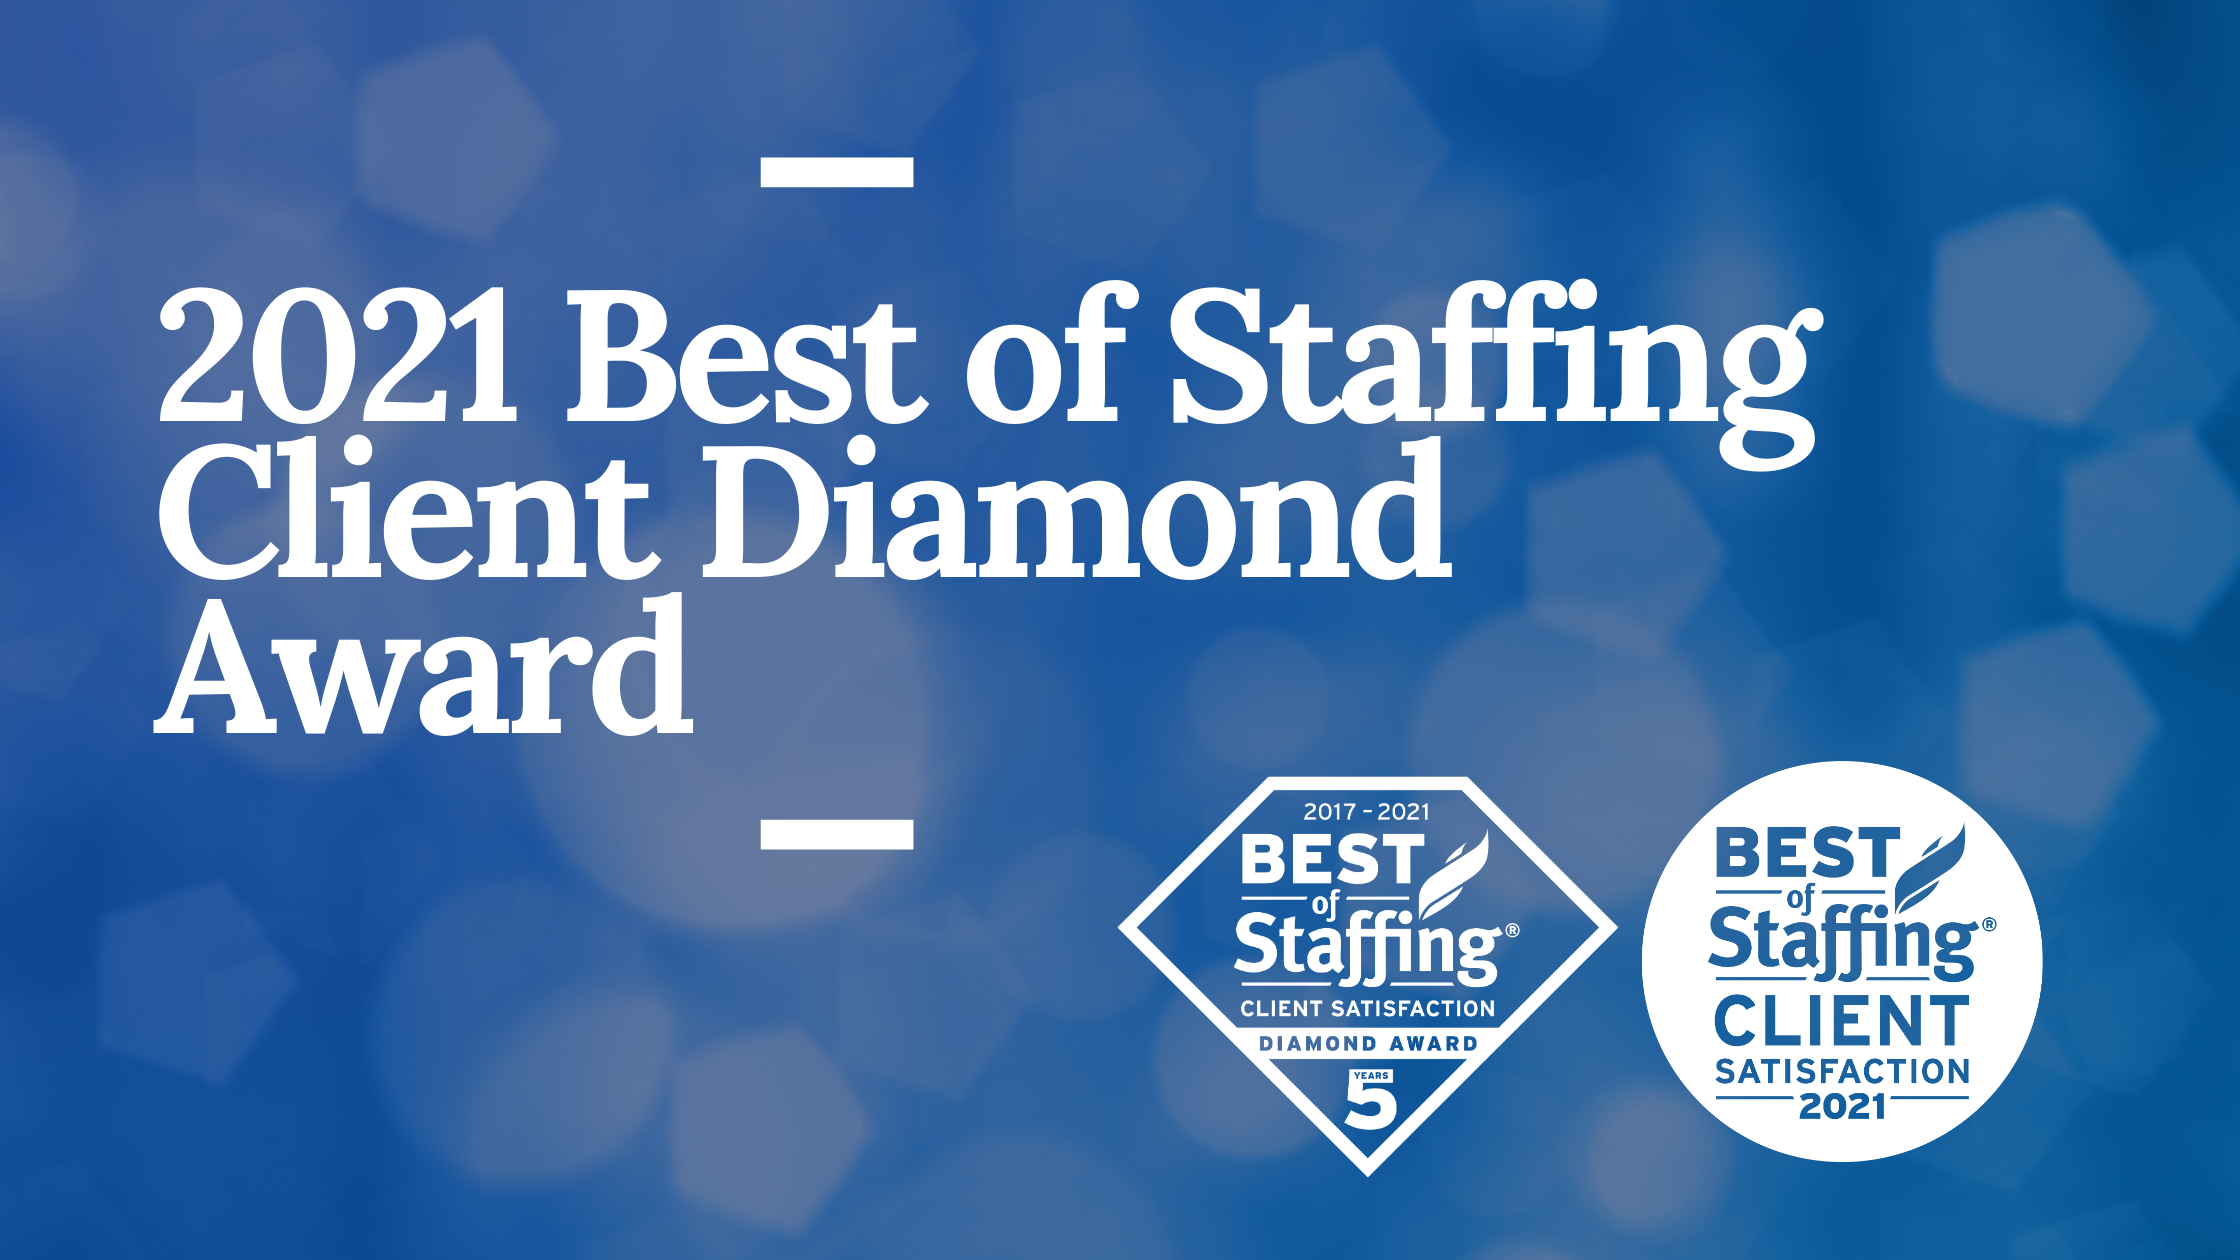 2021 Best of Staffing Client Diamond Award